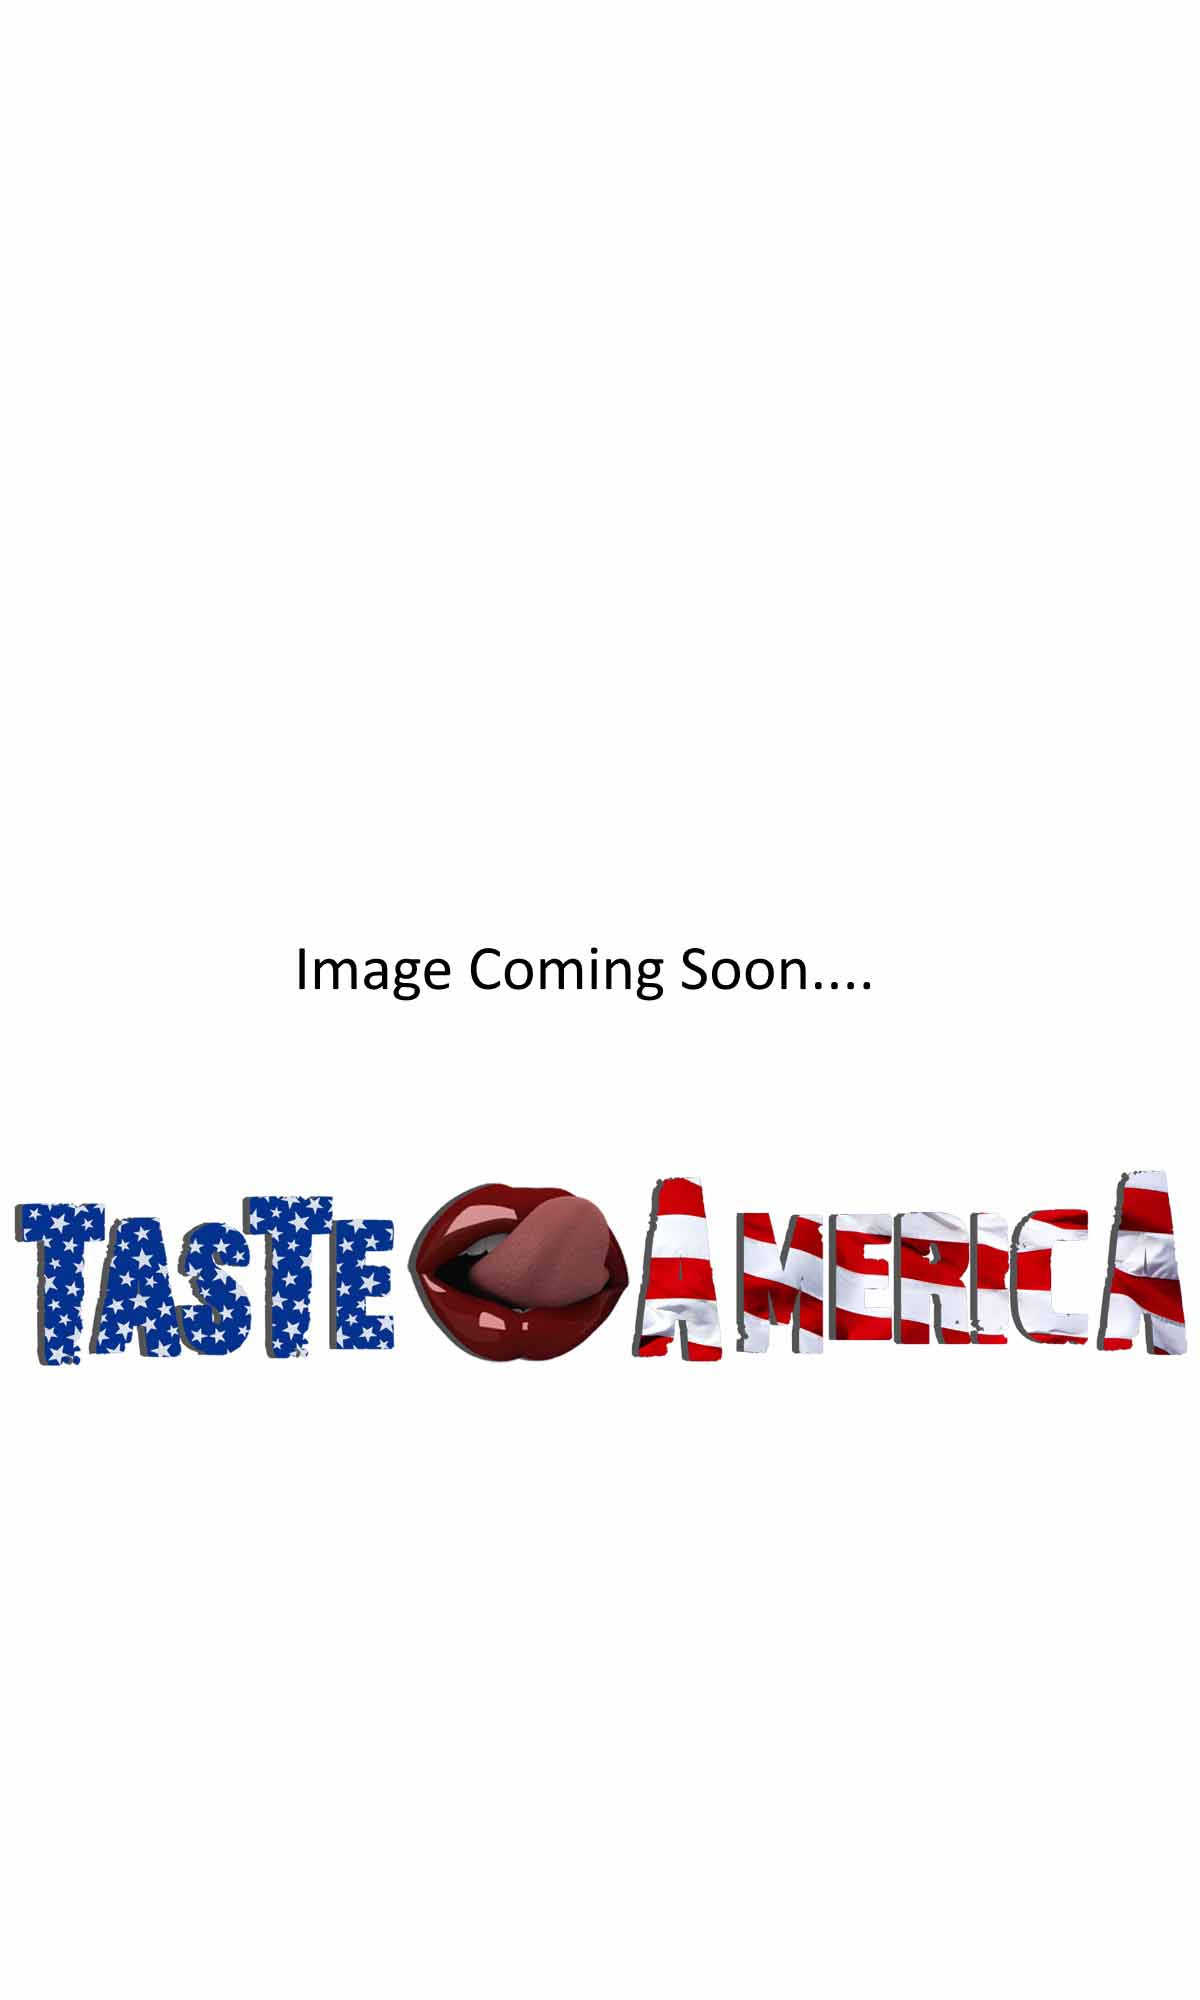 Buy Captain Crunchs Peanut Butter Crunch Cereal At Taste America LTD